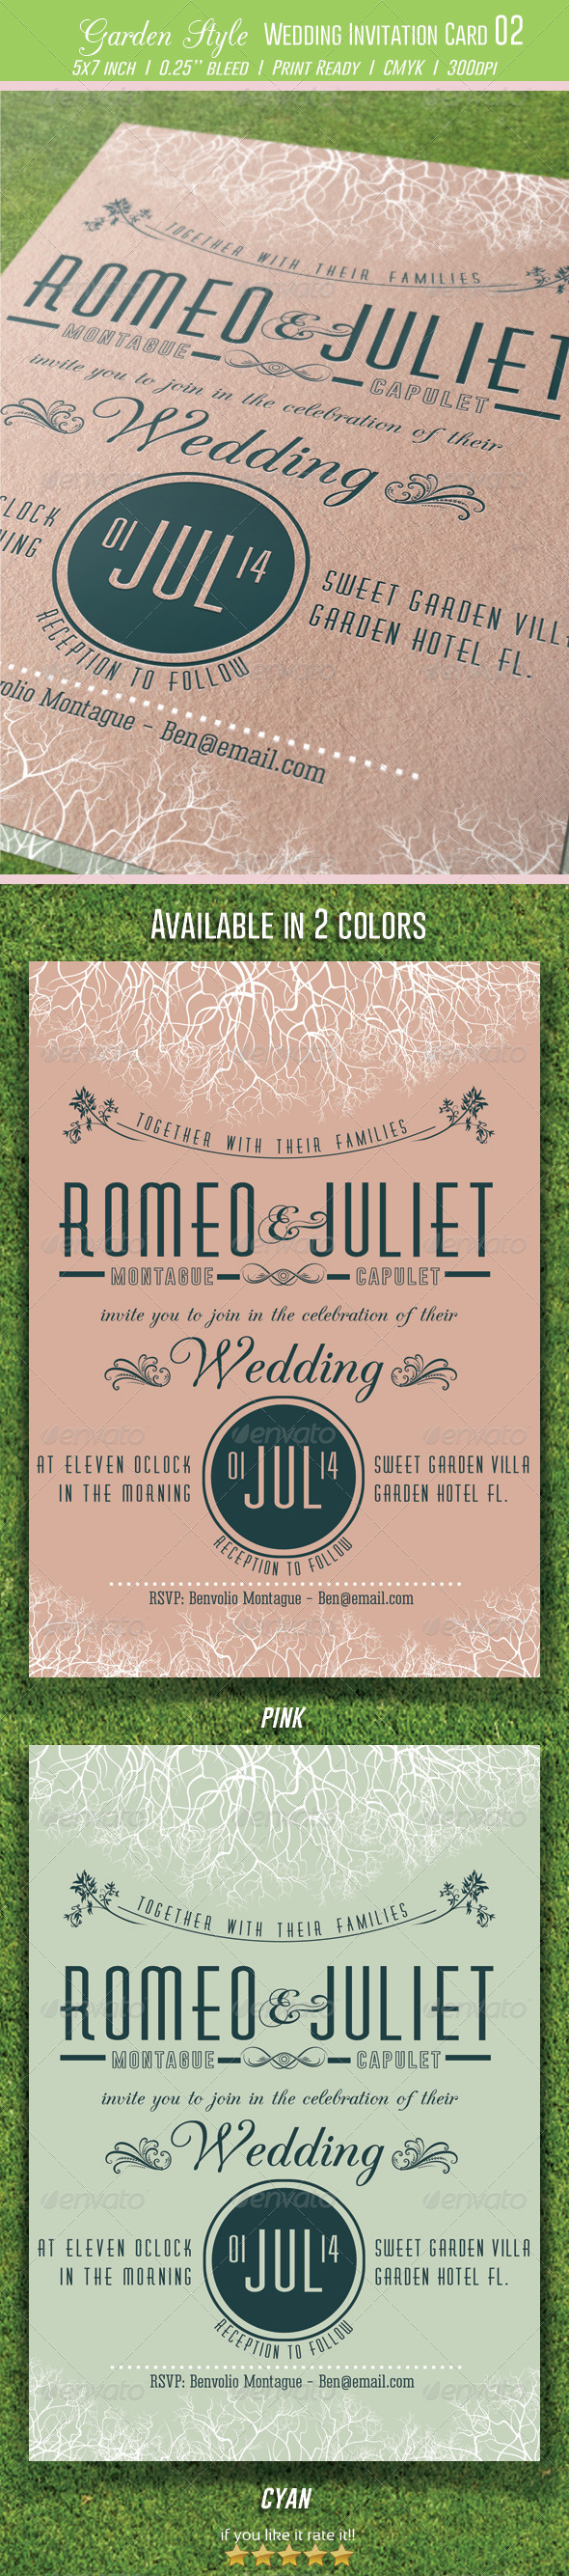 Garden Style Wedding Invitation Card 02